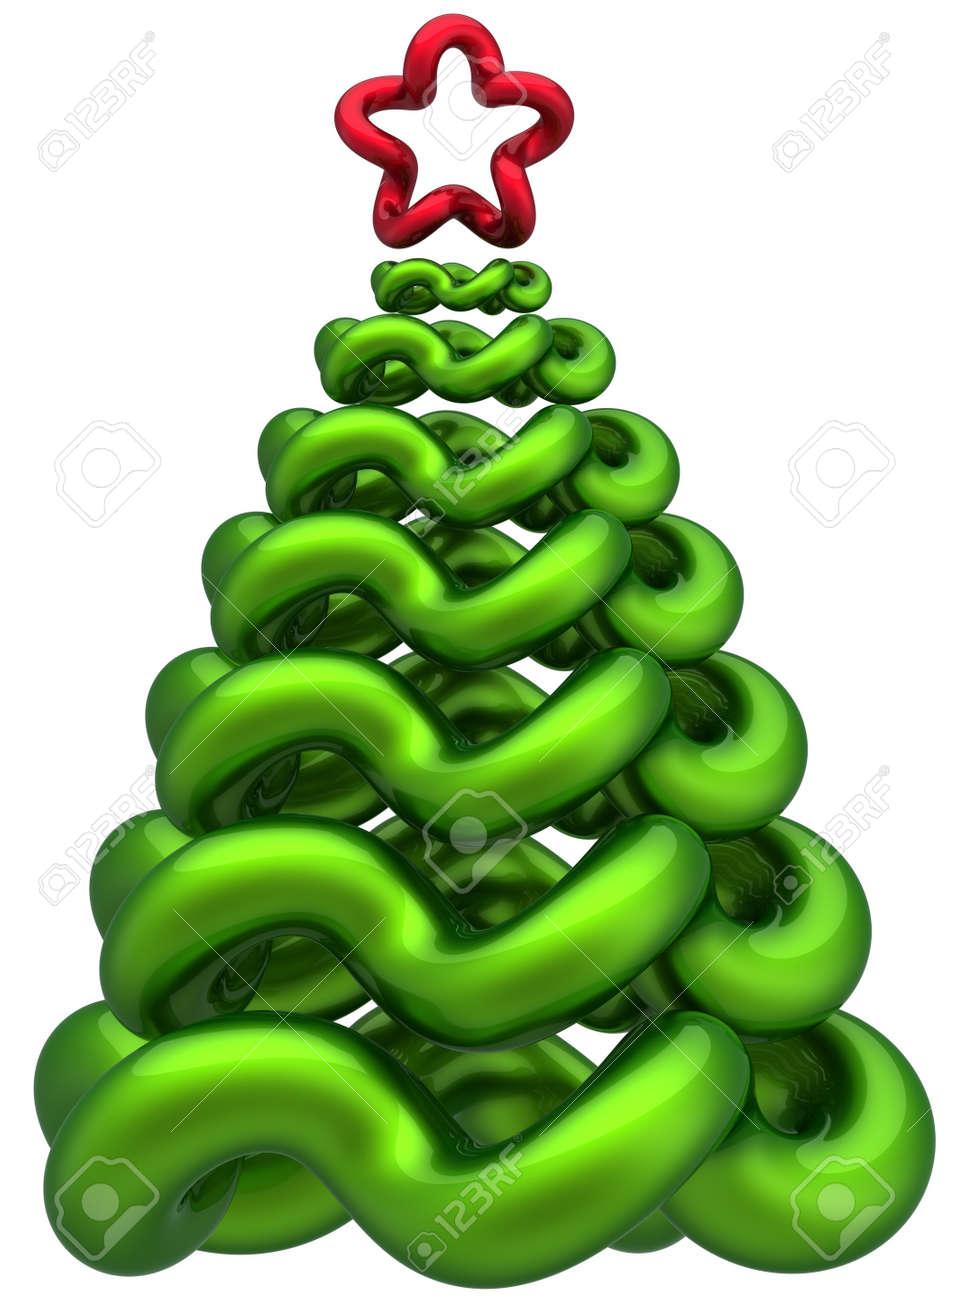 Abstract Christmas tree total Christmas Tree Shape With Star